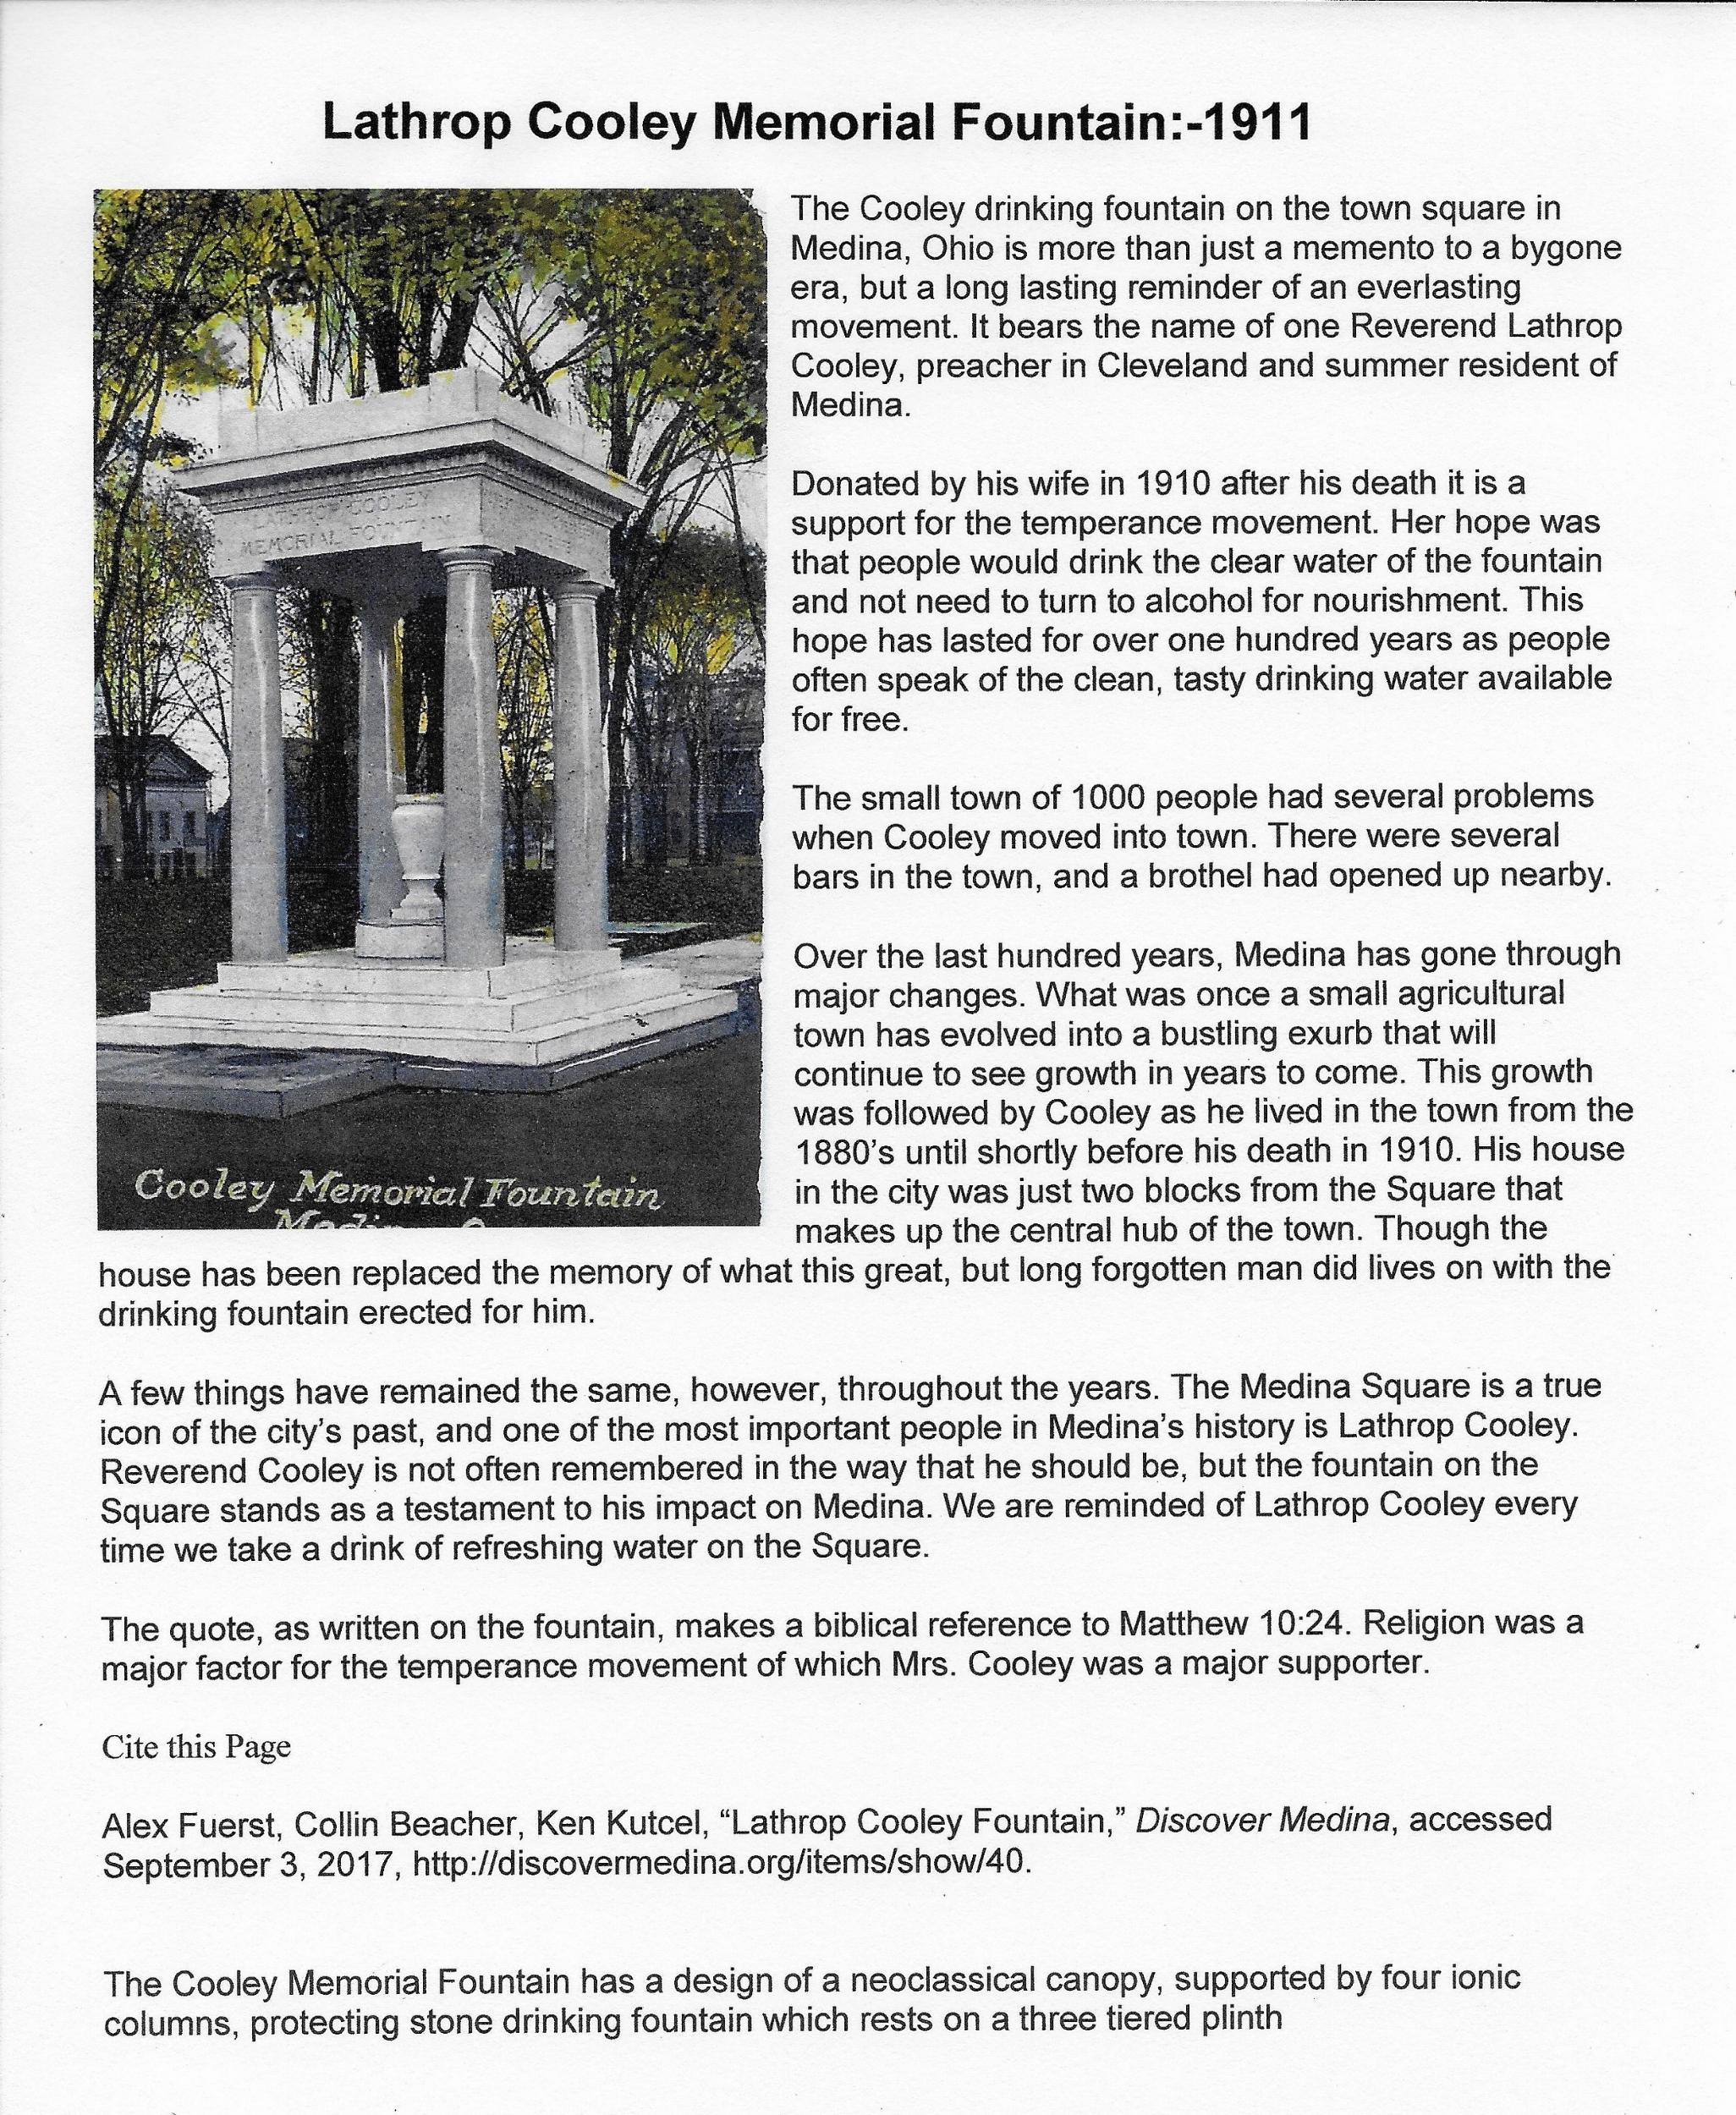 Lathrop Cooley Memorial Fountain 1911.jpeg